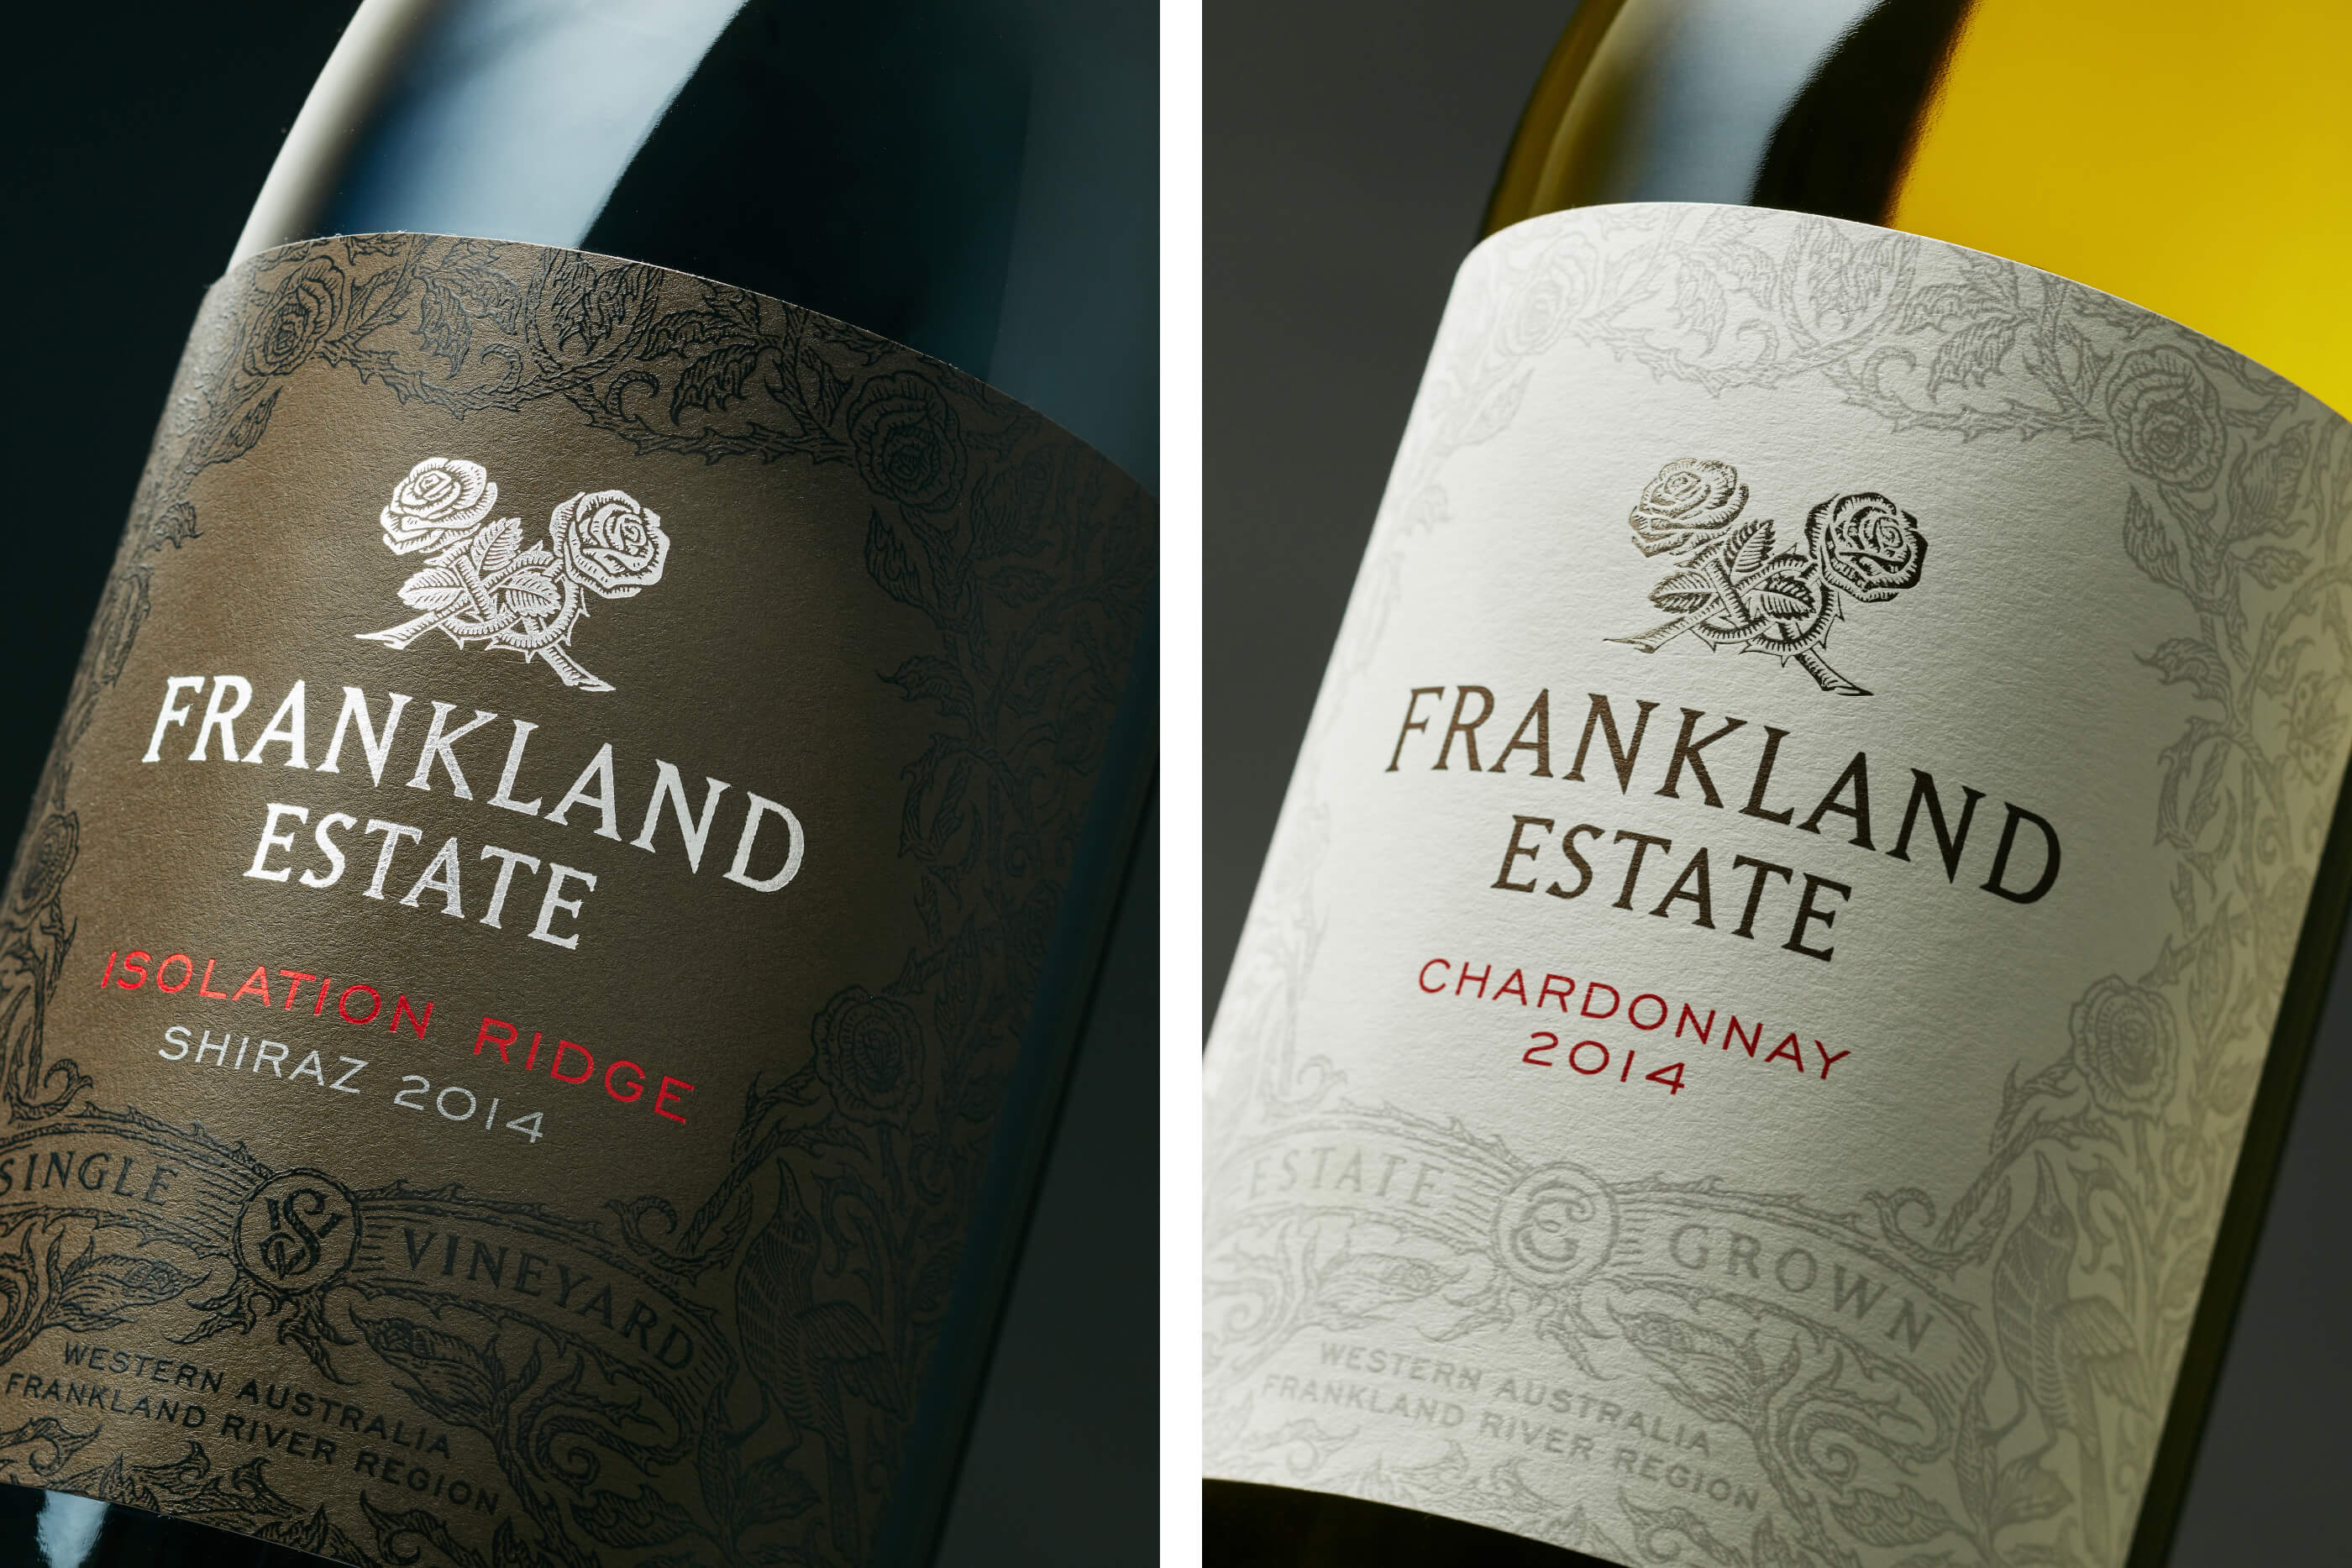 frankland_estate_isolation_ridge